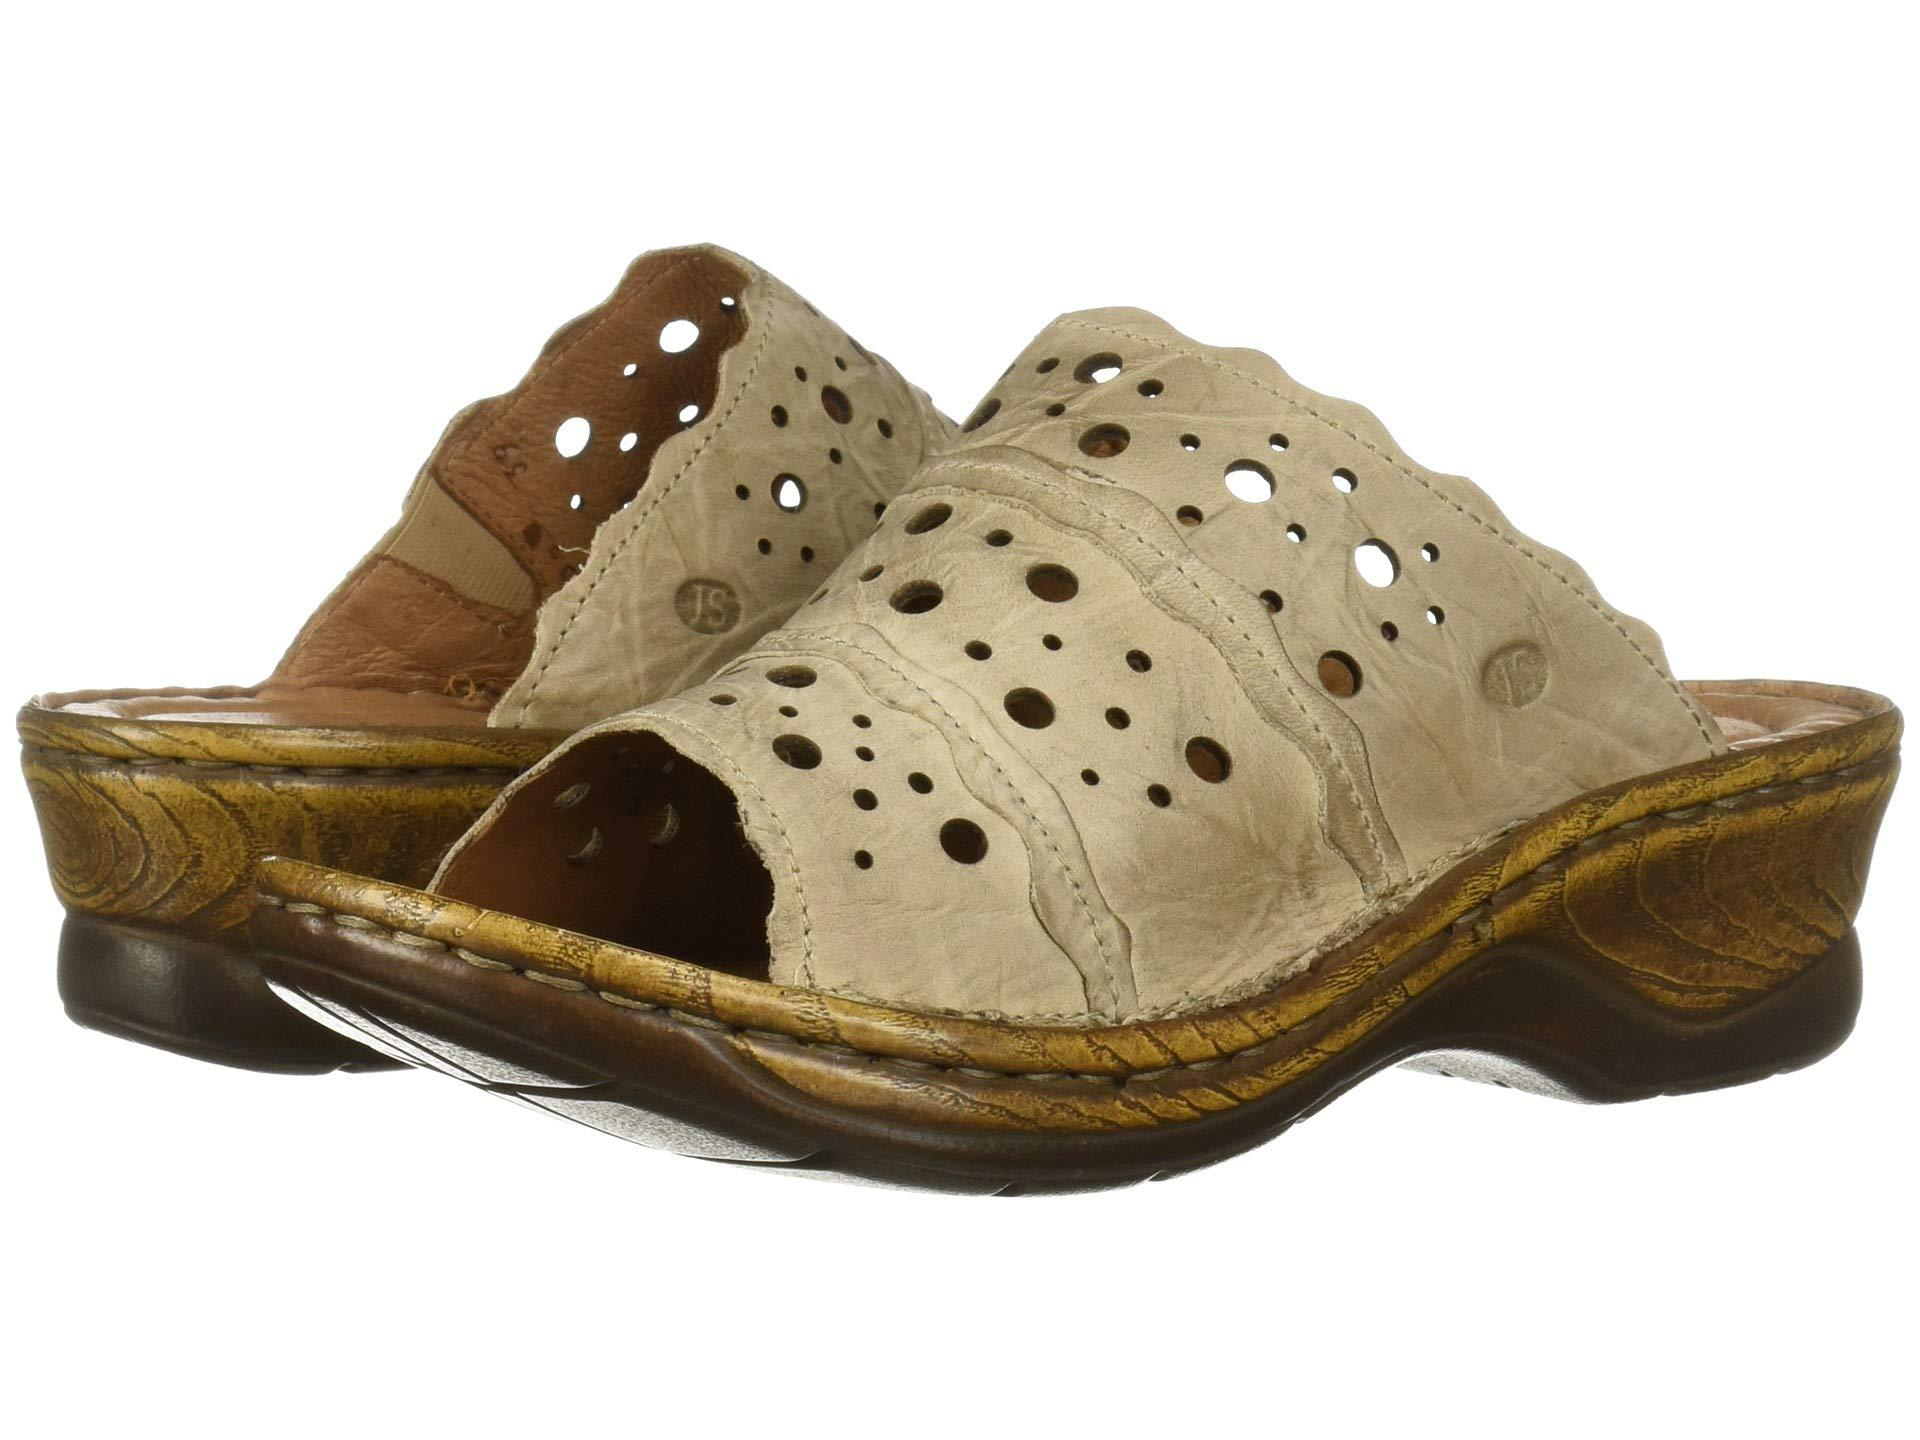 c4ce6b330f137 Josef Seibel Catalonia 43 (black) Women's Clog/mule Shoes - Lyst